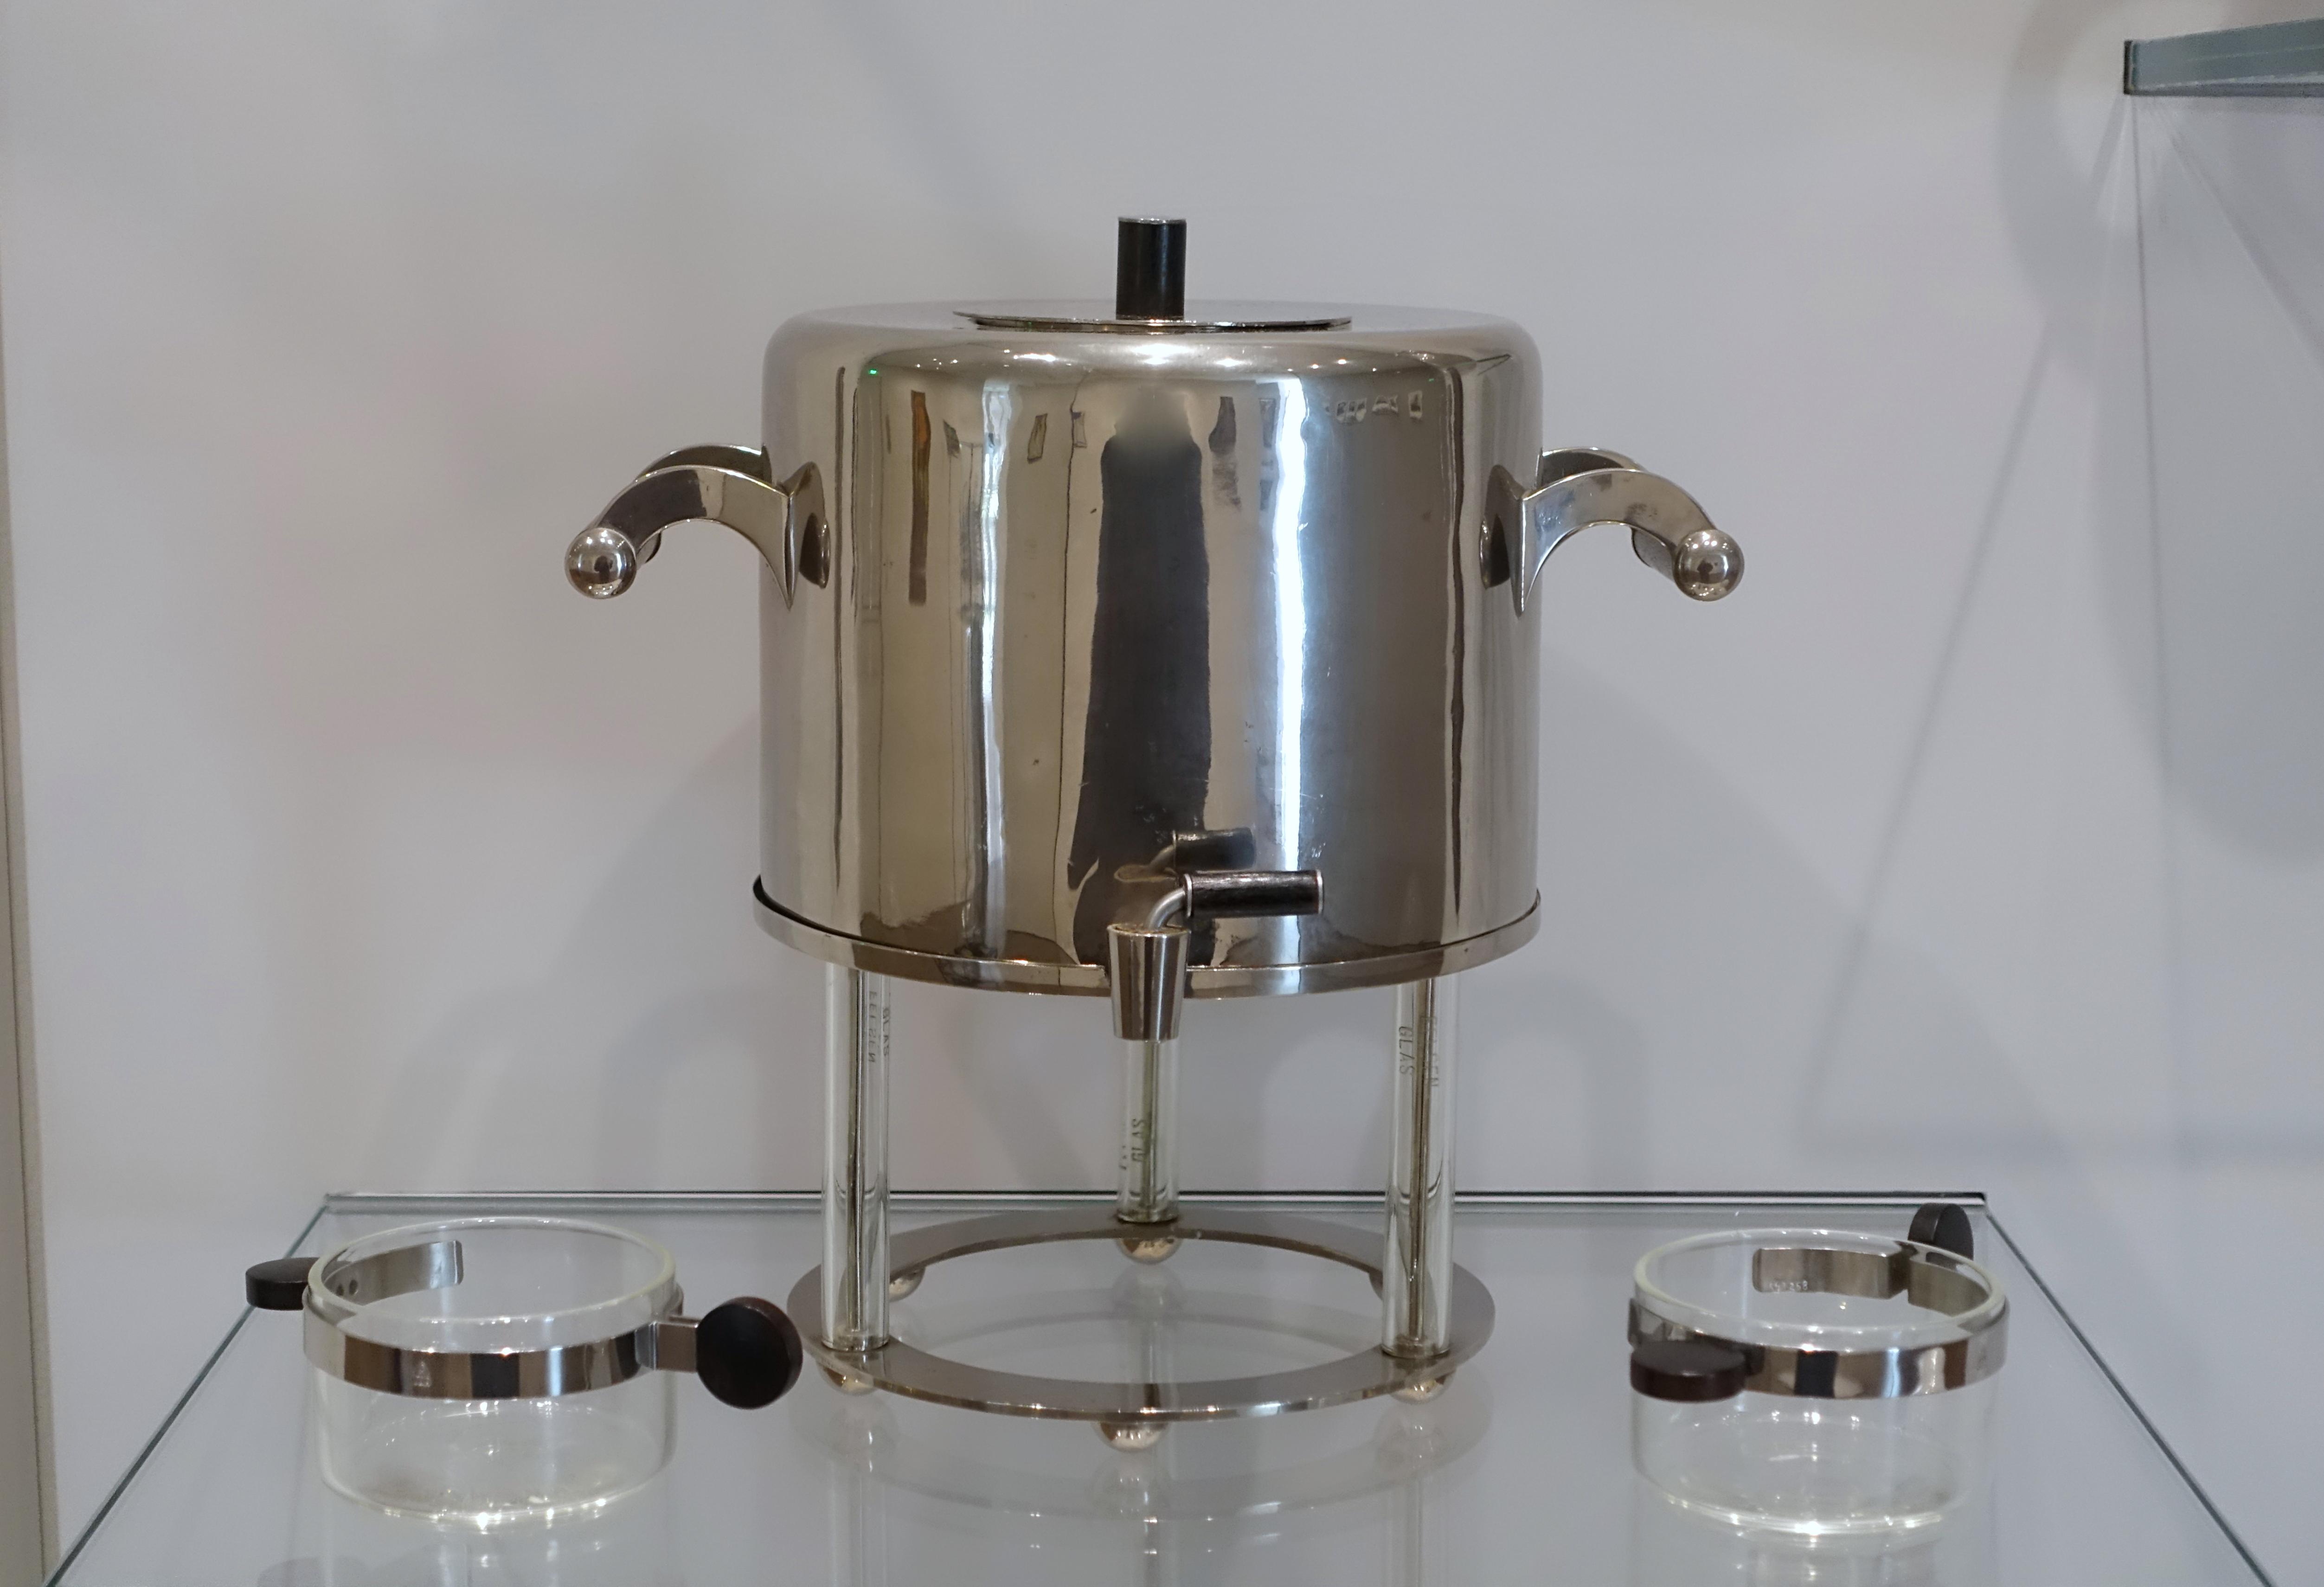 File:Samovar by Marianne Brandt, 1925, nickel silver, ebony, glass, and Tea glass holders by Josef Albers, 1925, chrome-plated steel and ebony - Busch-Reisinger Museum - Harvard University - DSC01622.jpg